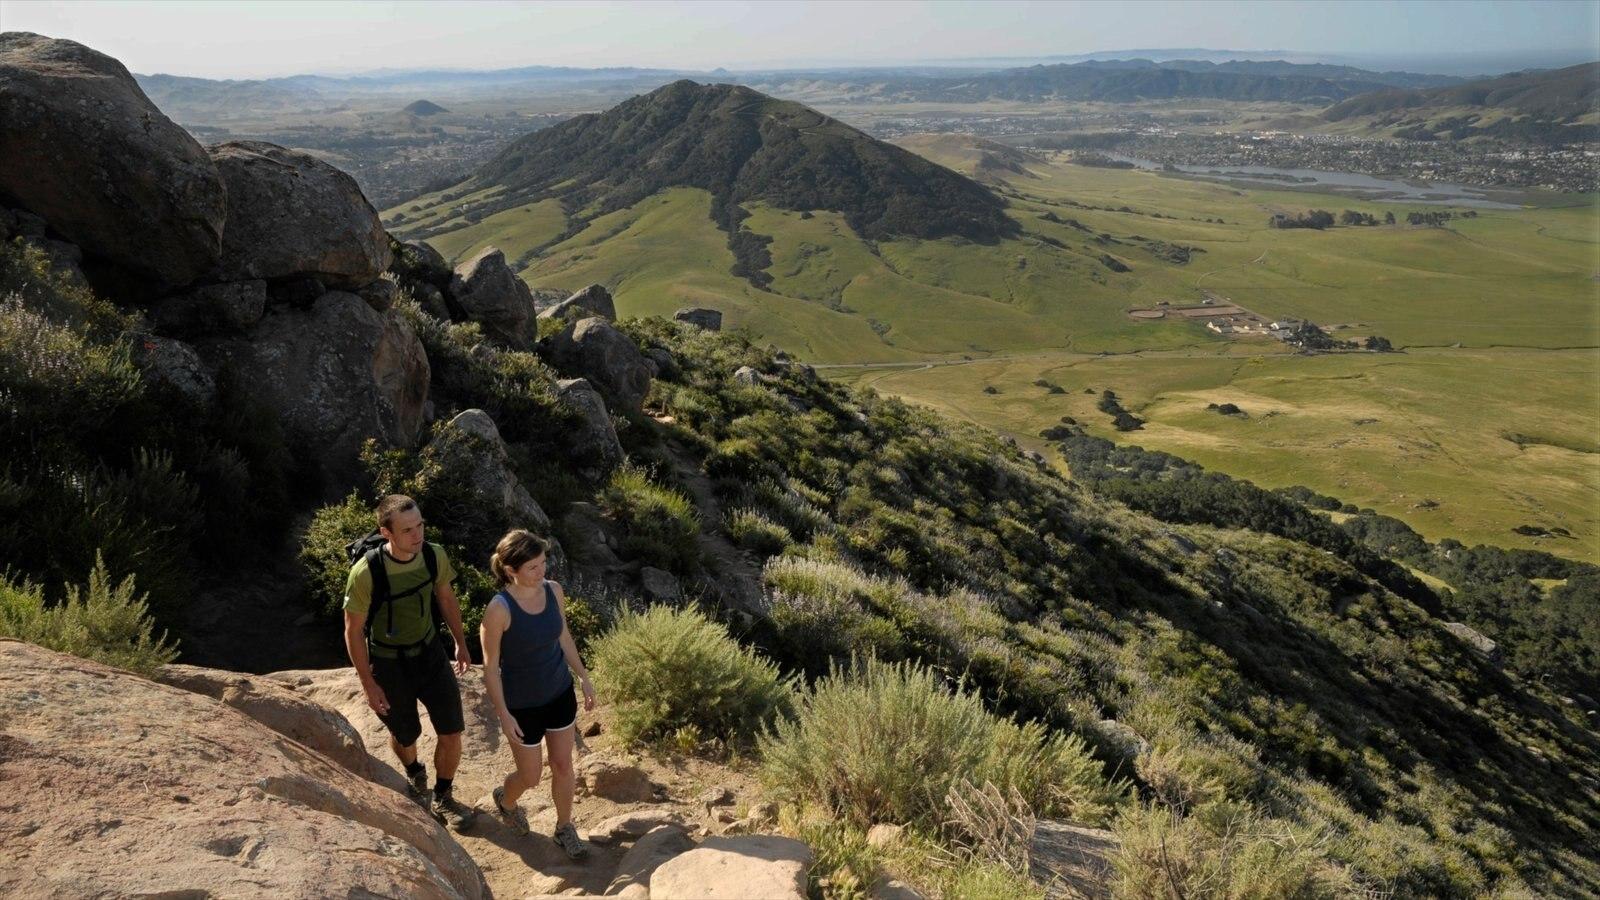 Mountain Pictures: View Images of San Luis Obispo